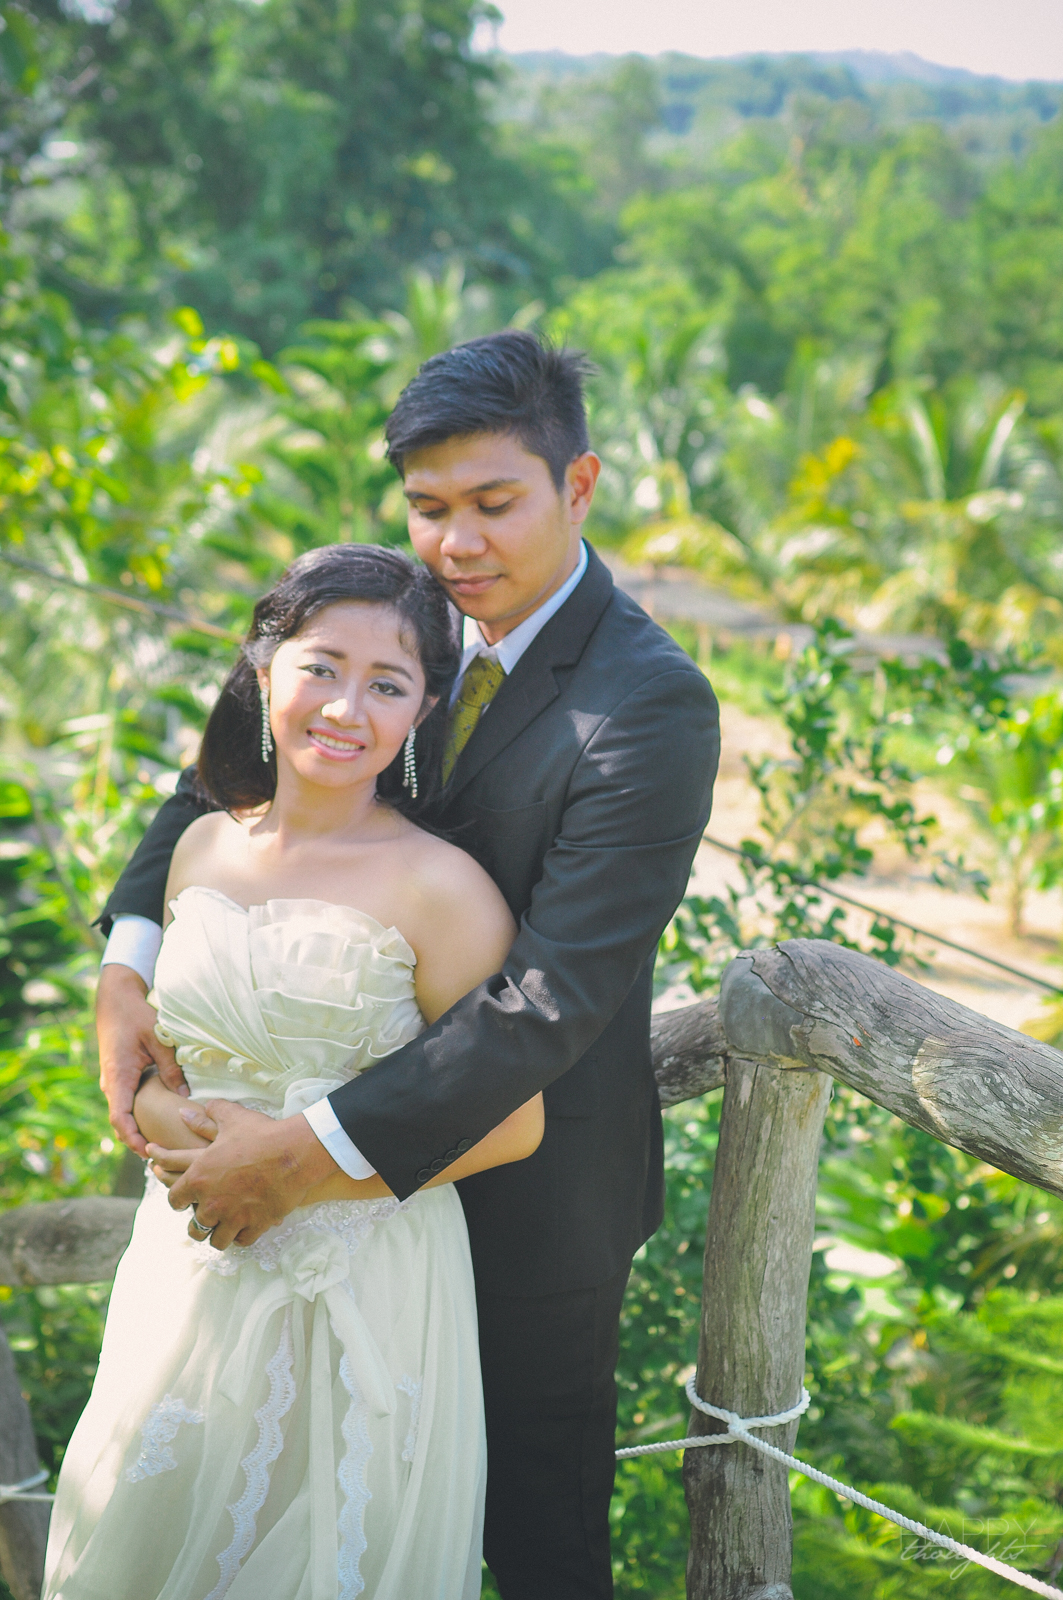 Alvin and monsey wedding